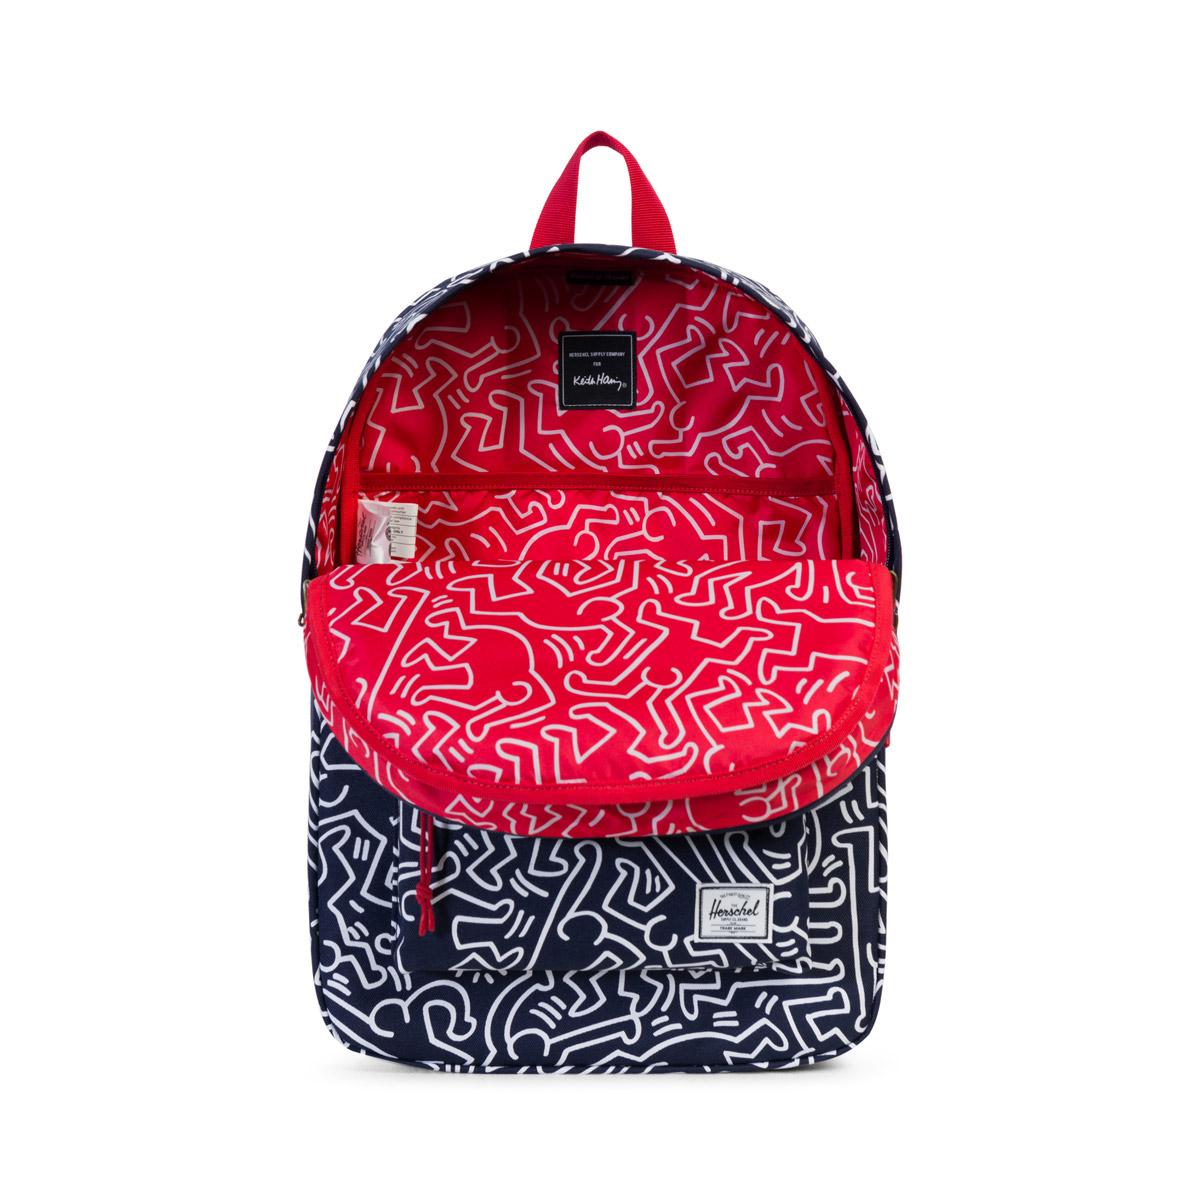 Herschel Supply Keith Haring Collection